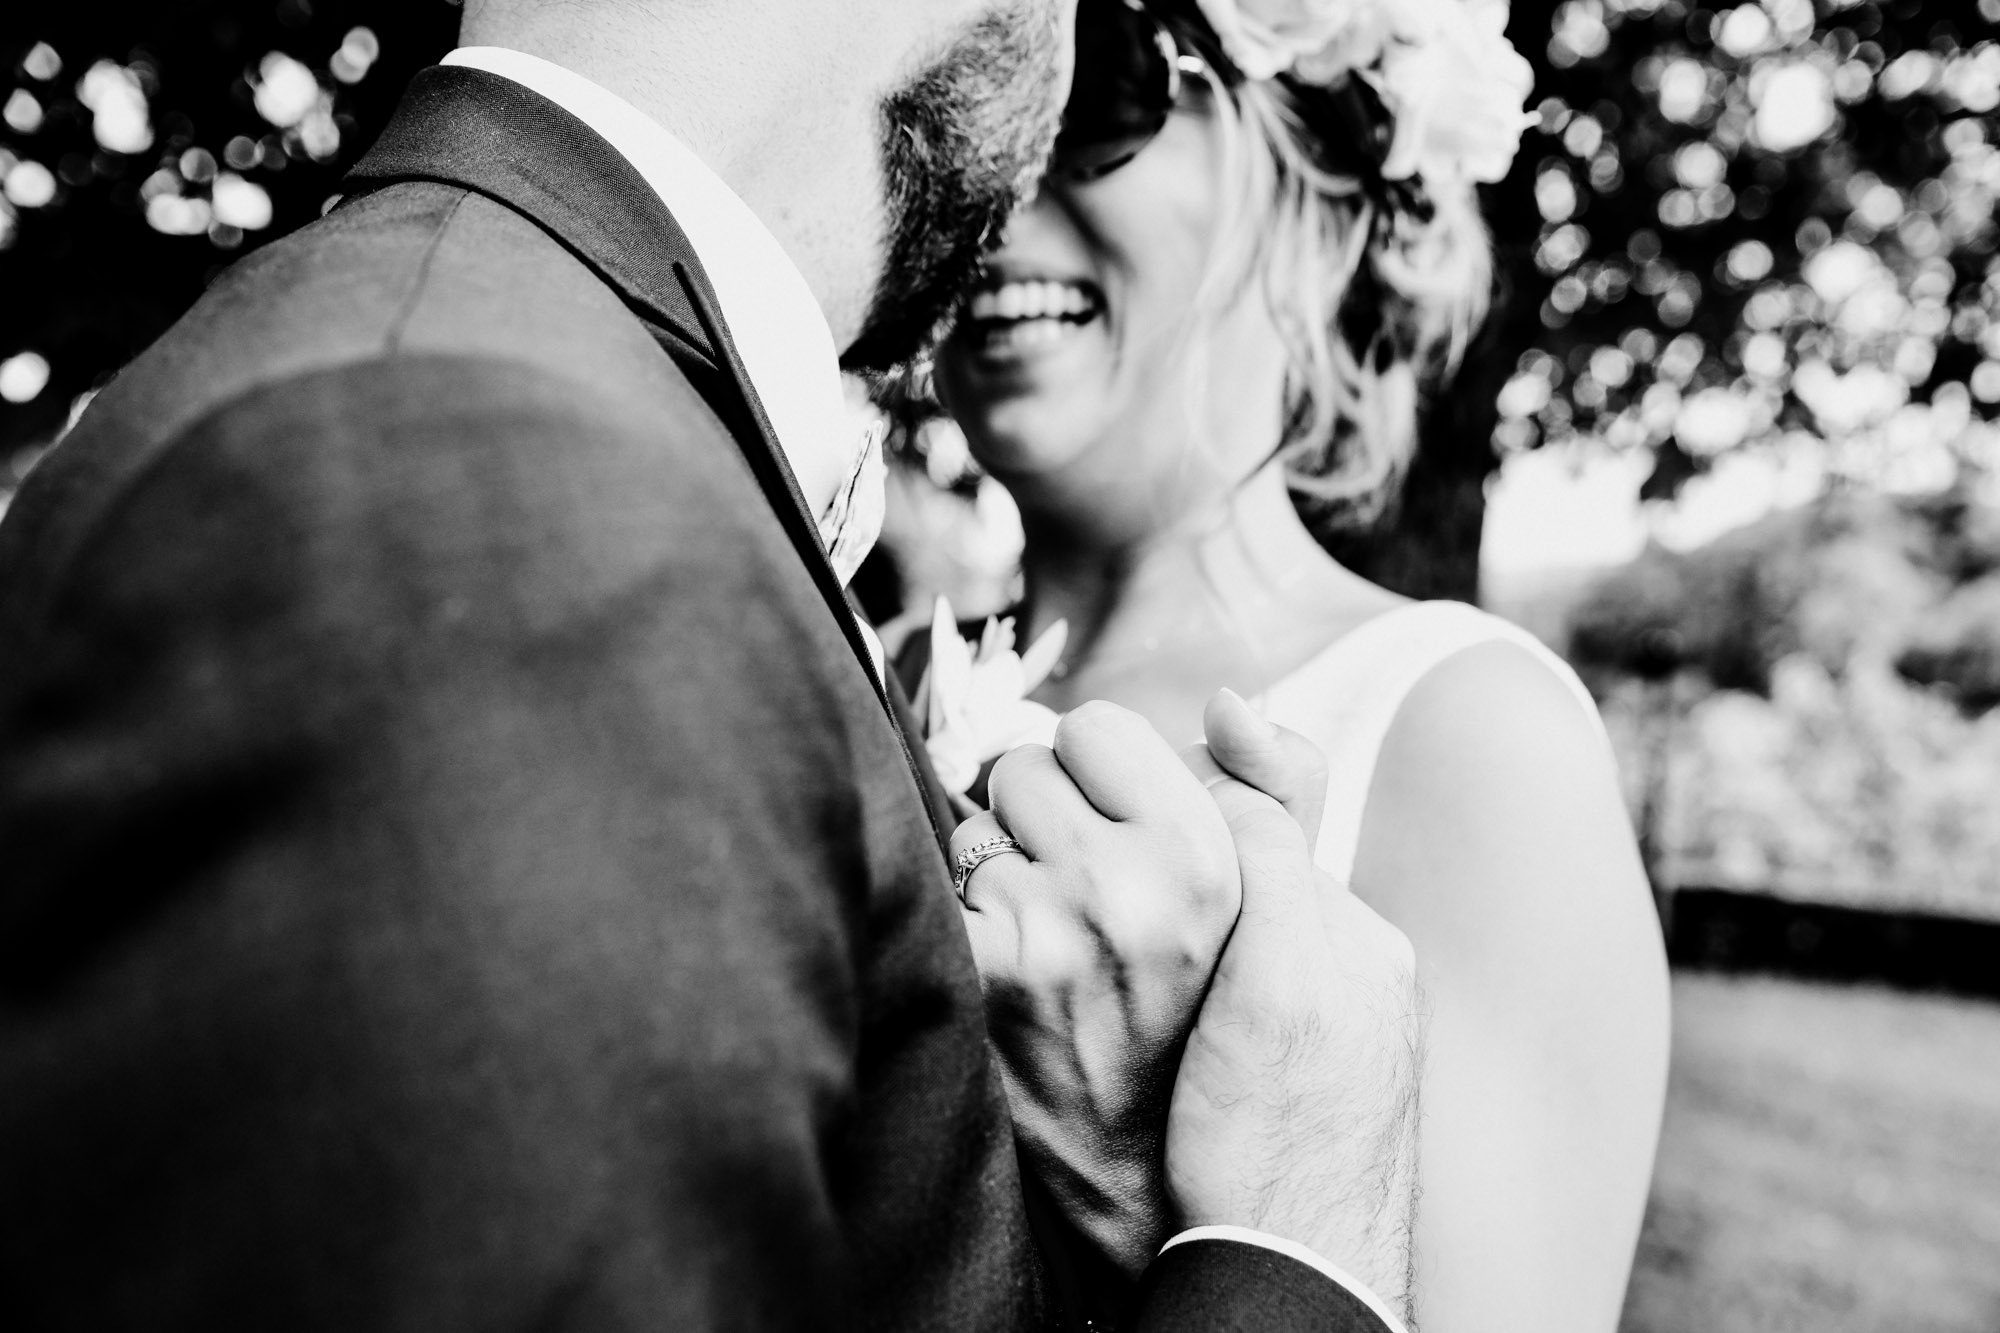 2018-07-21 - LD8_0239 - photographe mariage lyon - laurie diaz - www.lauriediazweeding.com.jpg